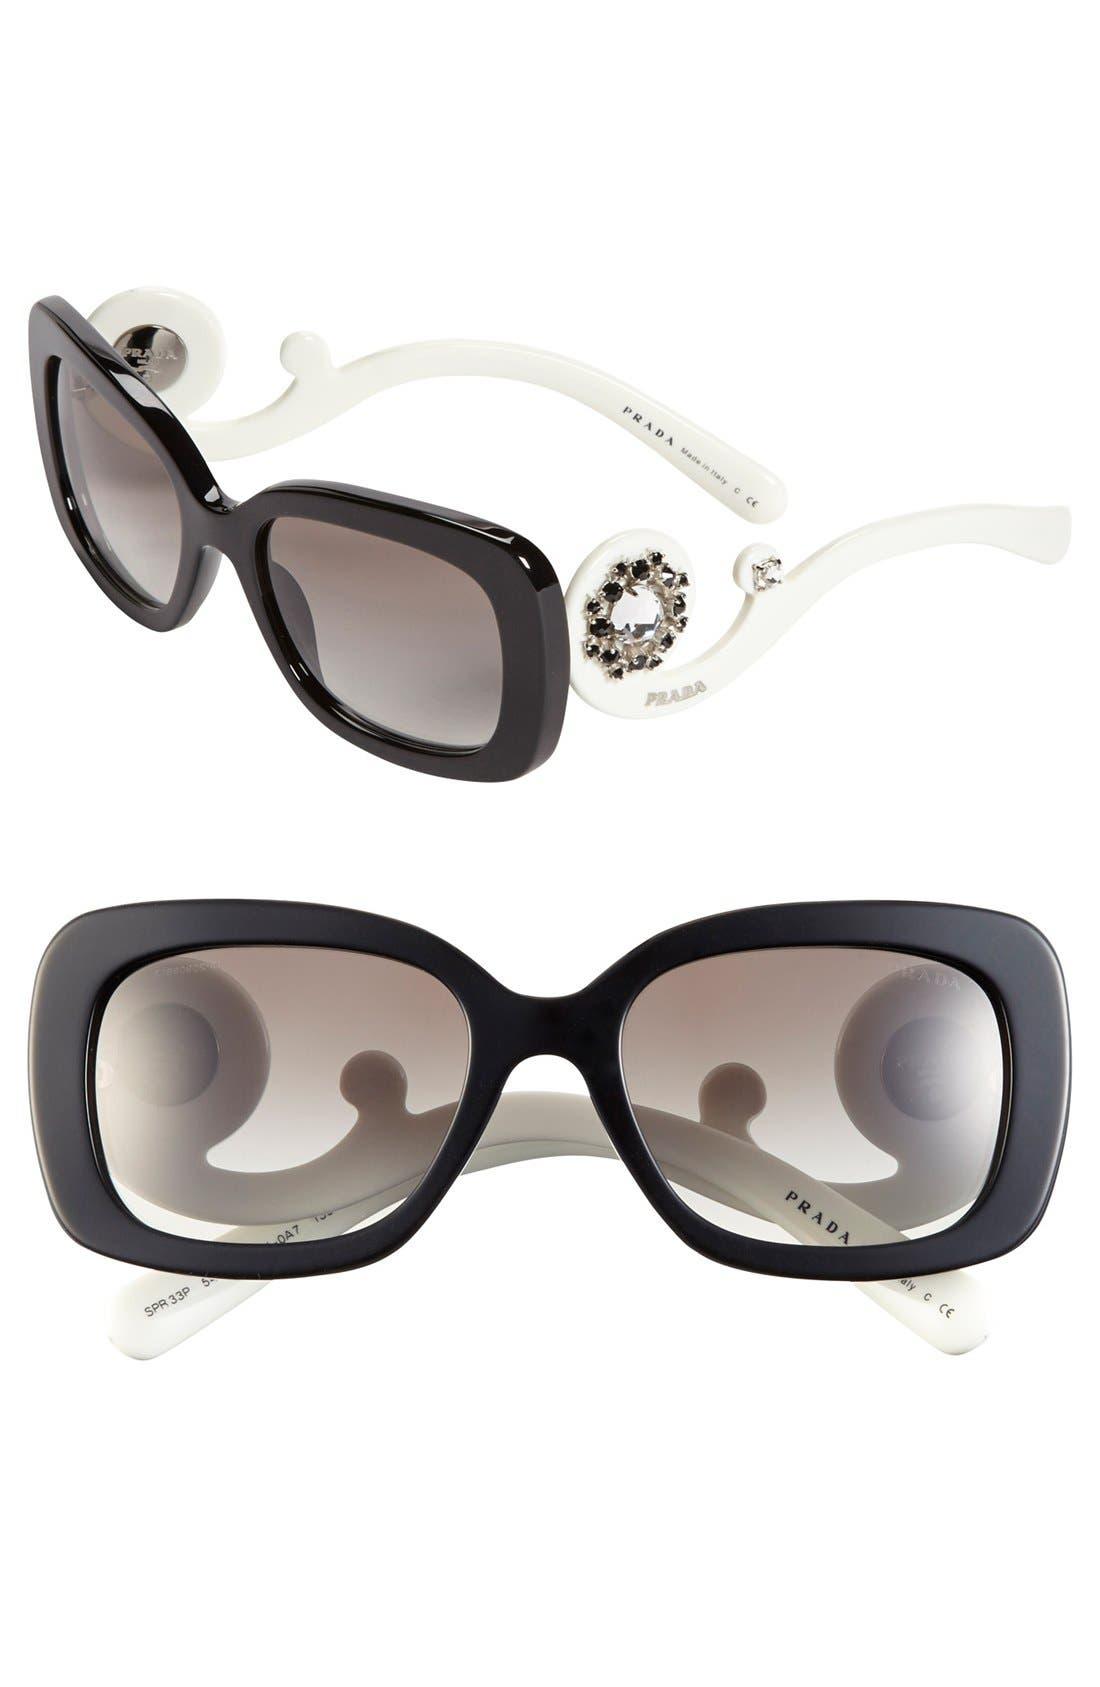 Main Image - Prada 54mm Polarized Sunglasses